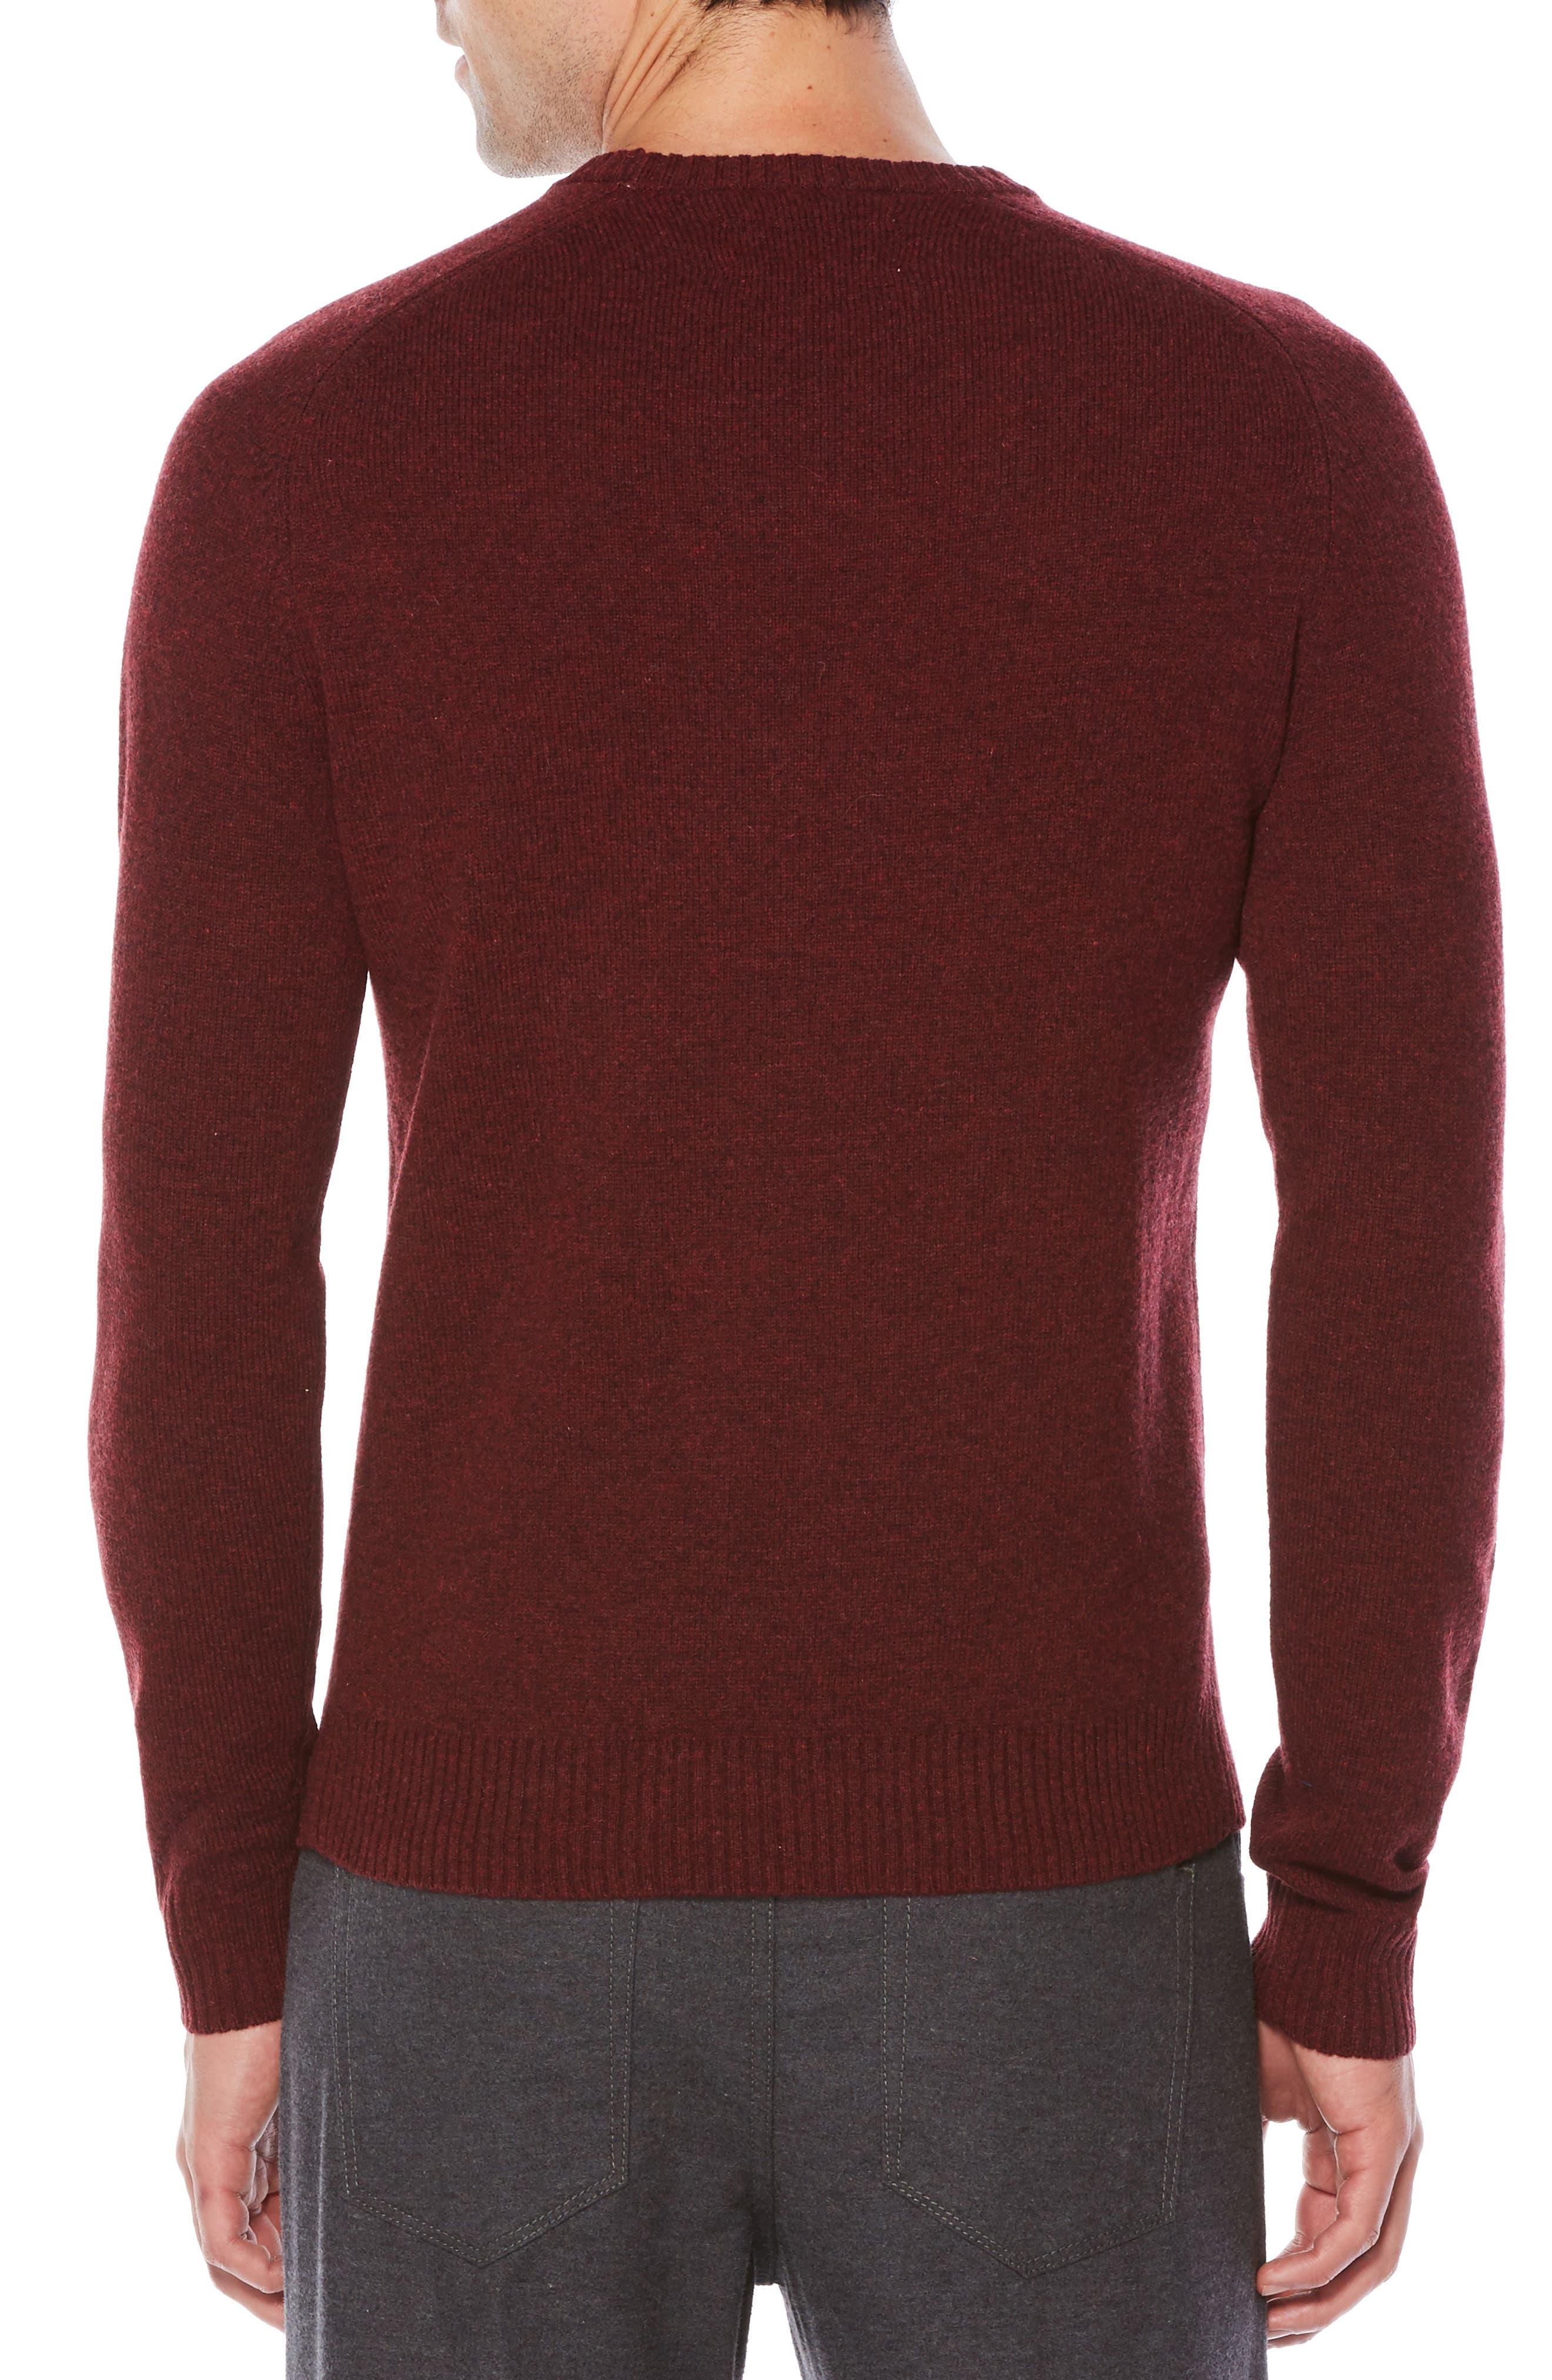 P55 Lambswool Sweater,                             Alternate thumbnail 8, color,